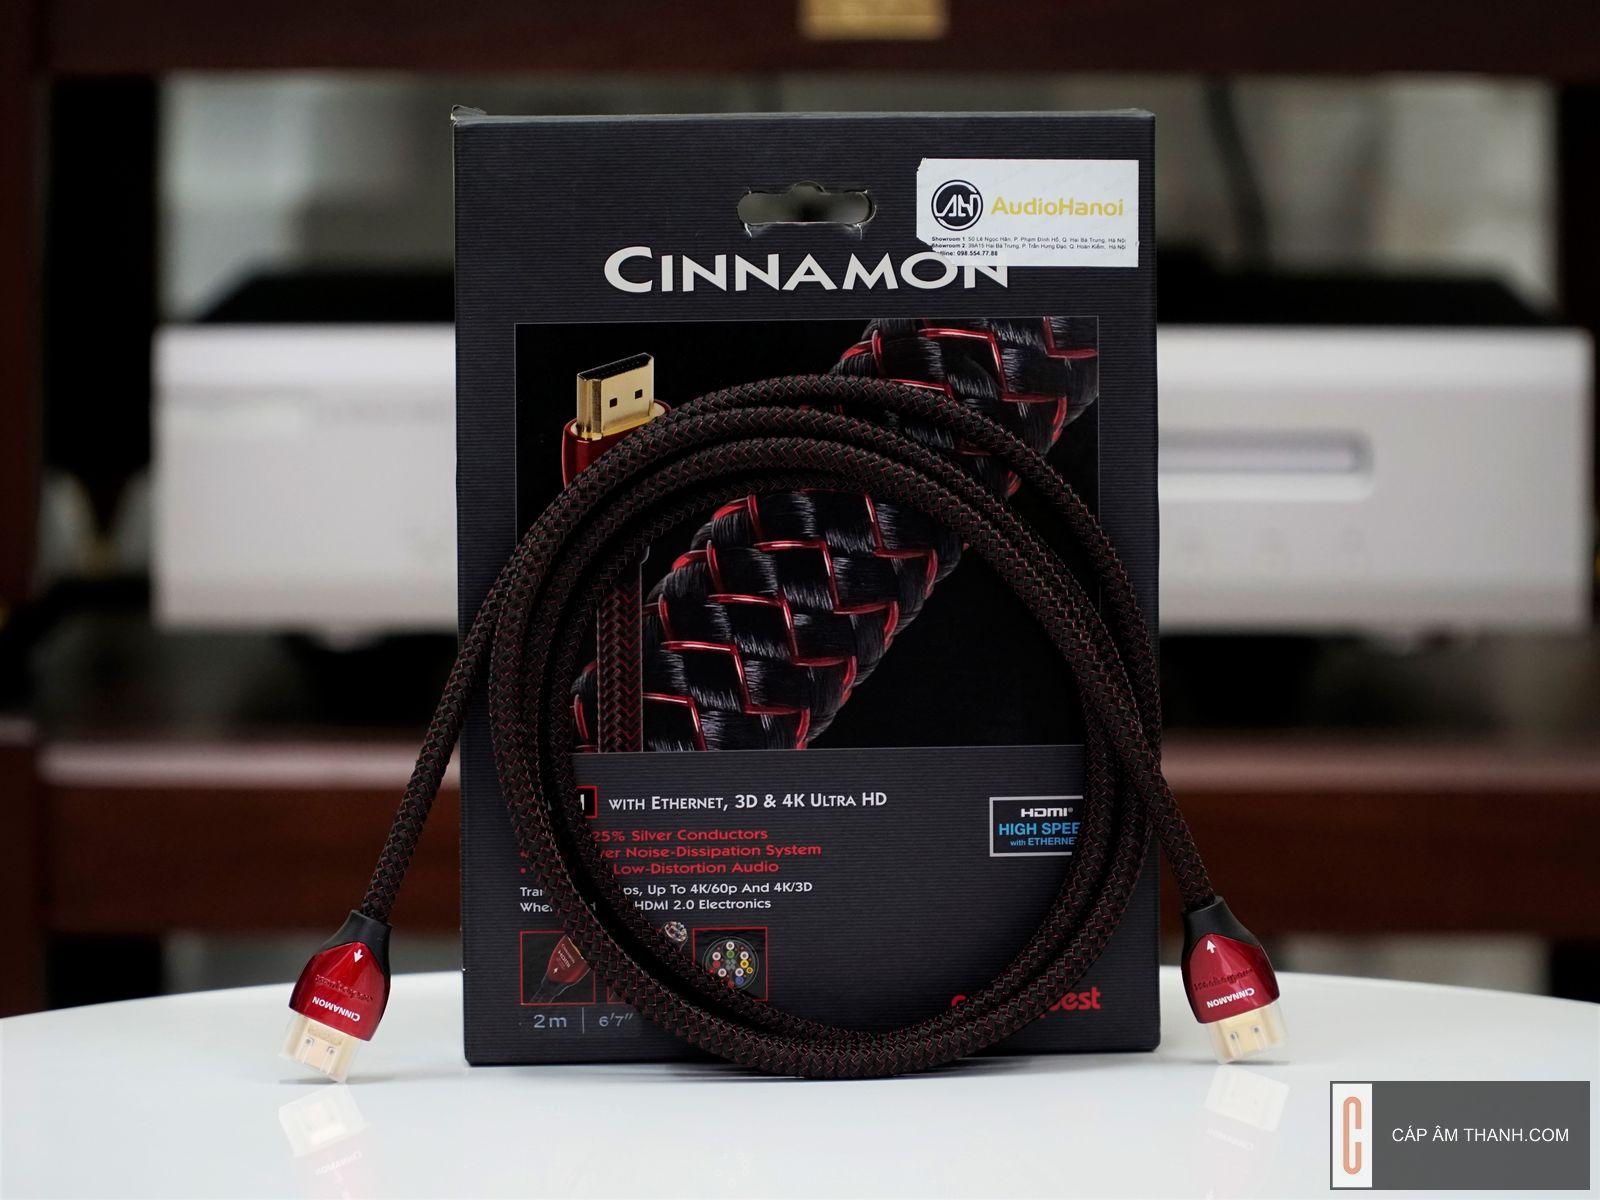 HDMI Audioquest Cinnamon 2m